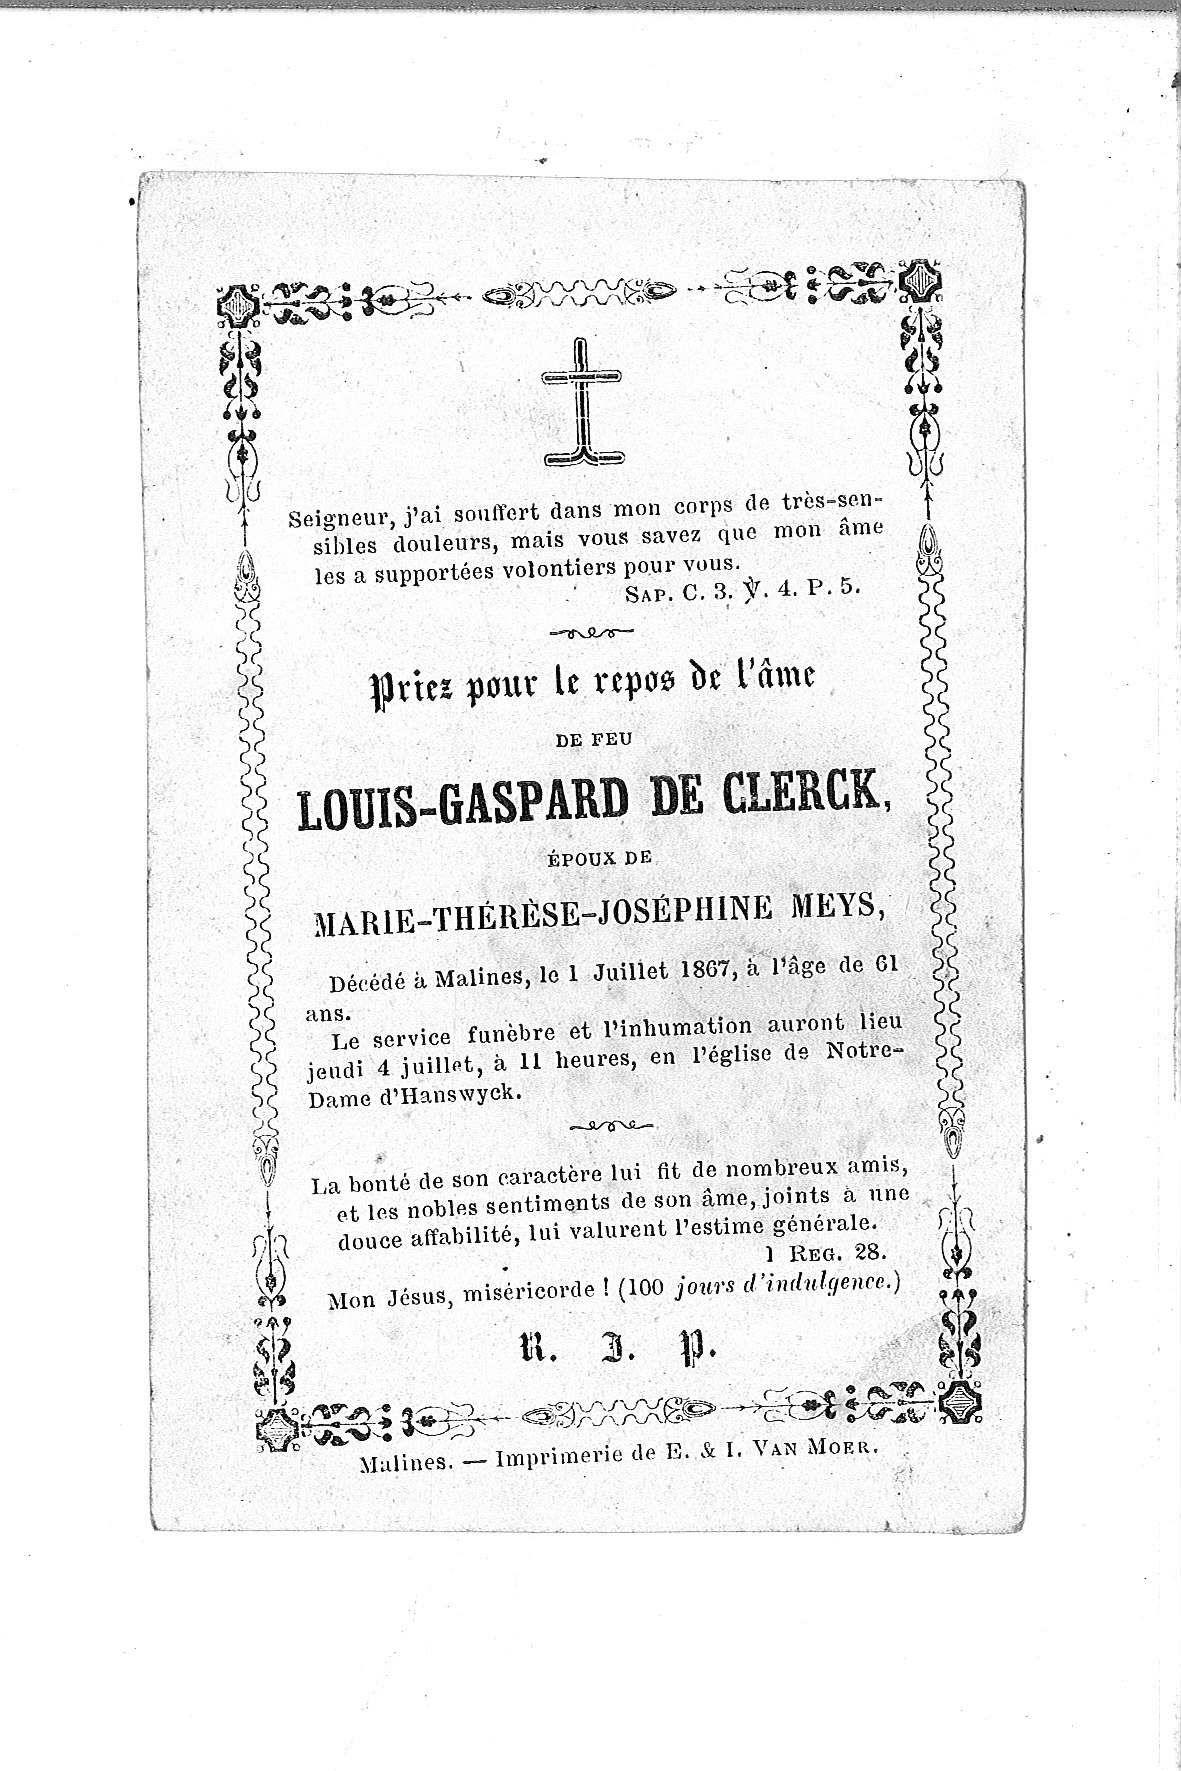 louis-gaspard(1867)20120906084901_00007.jpg